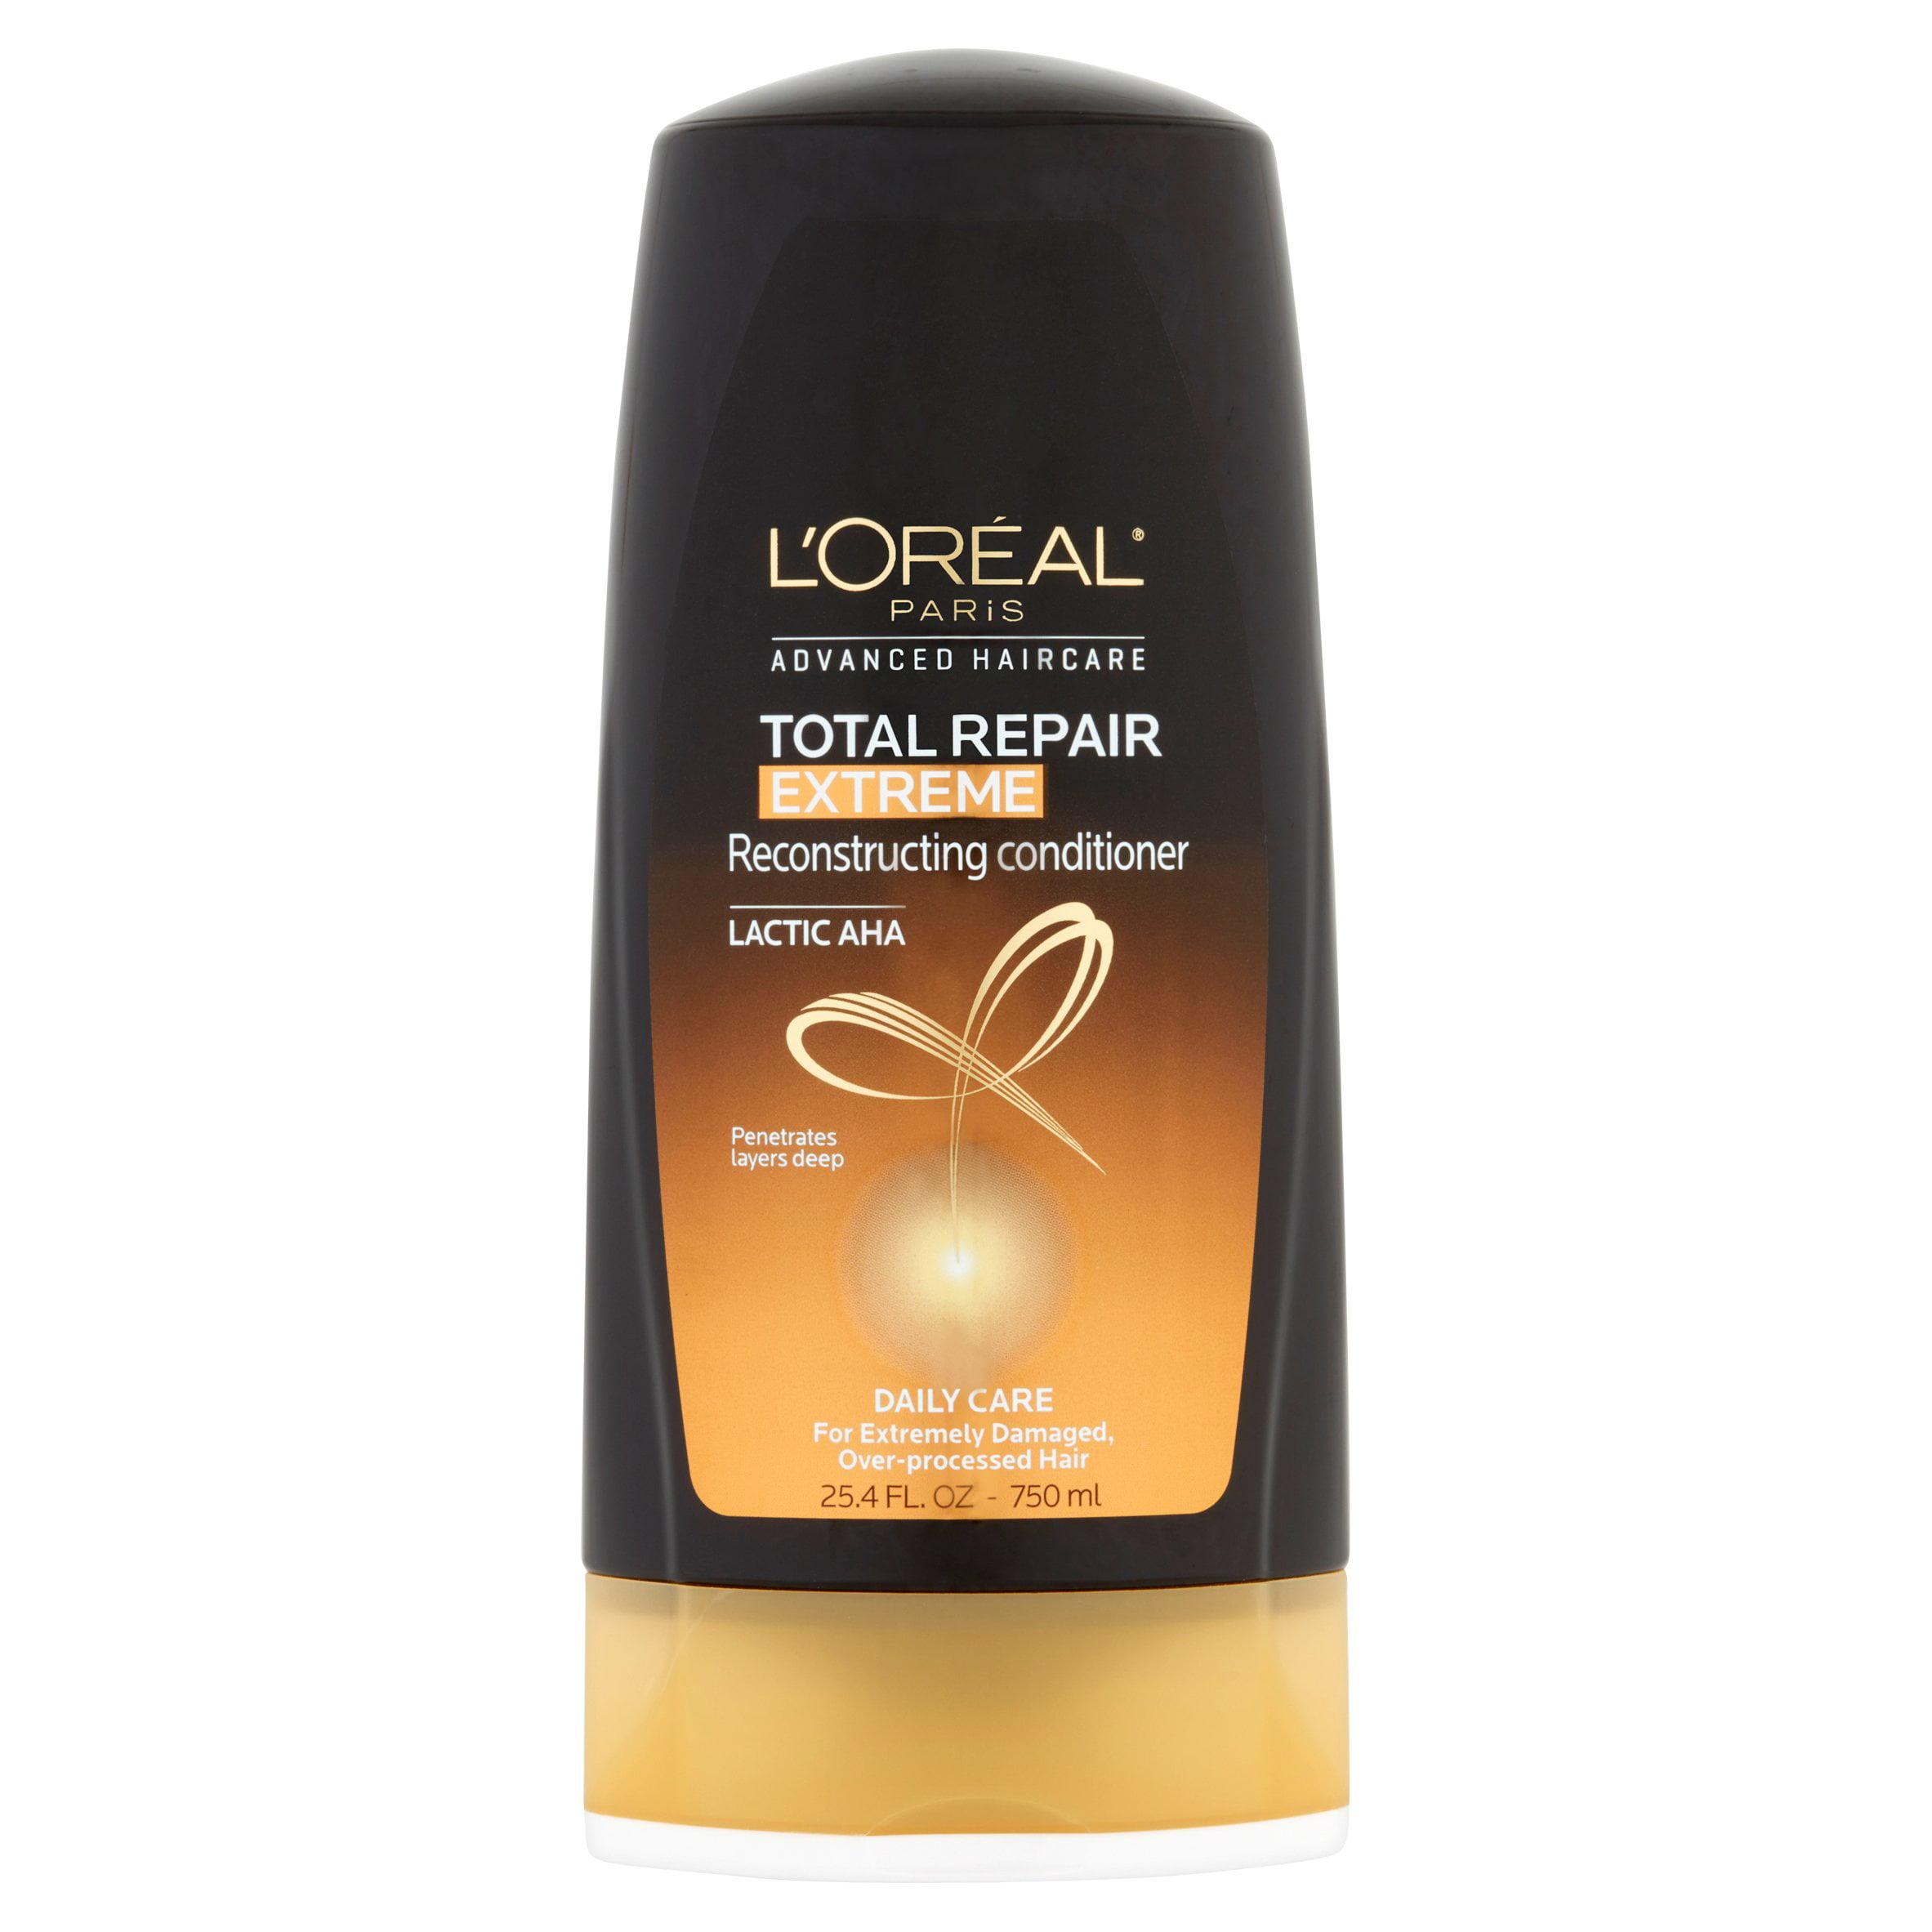 L'Oreal Paris Hair Expert Total Repair Extreme Reconstructing Conditioner 25.4 FL OZ - Walmart.com